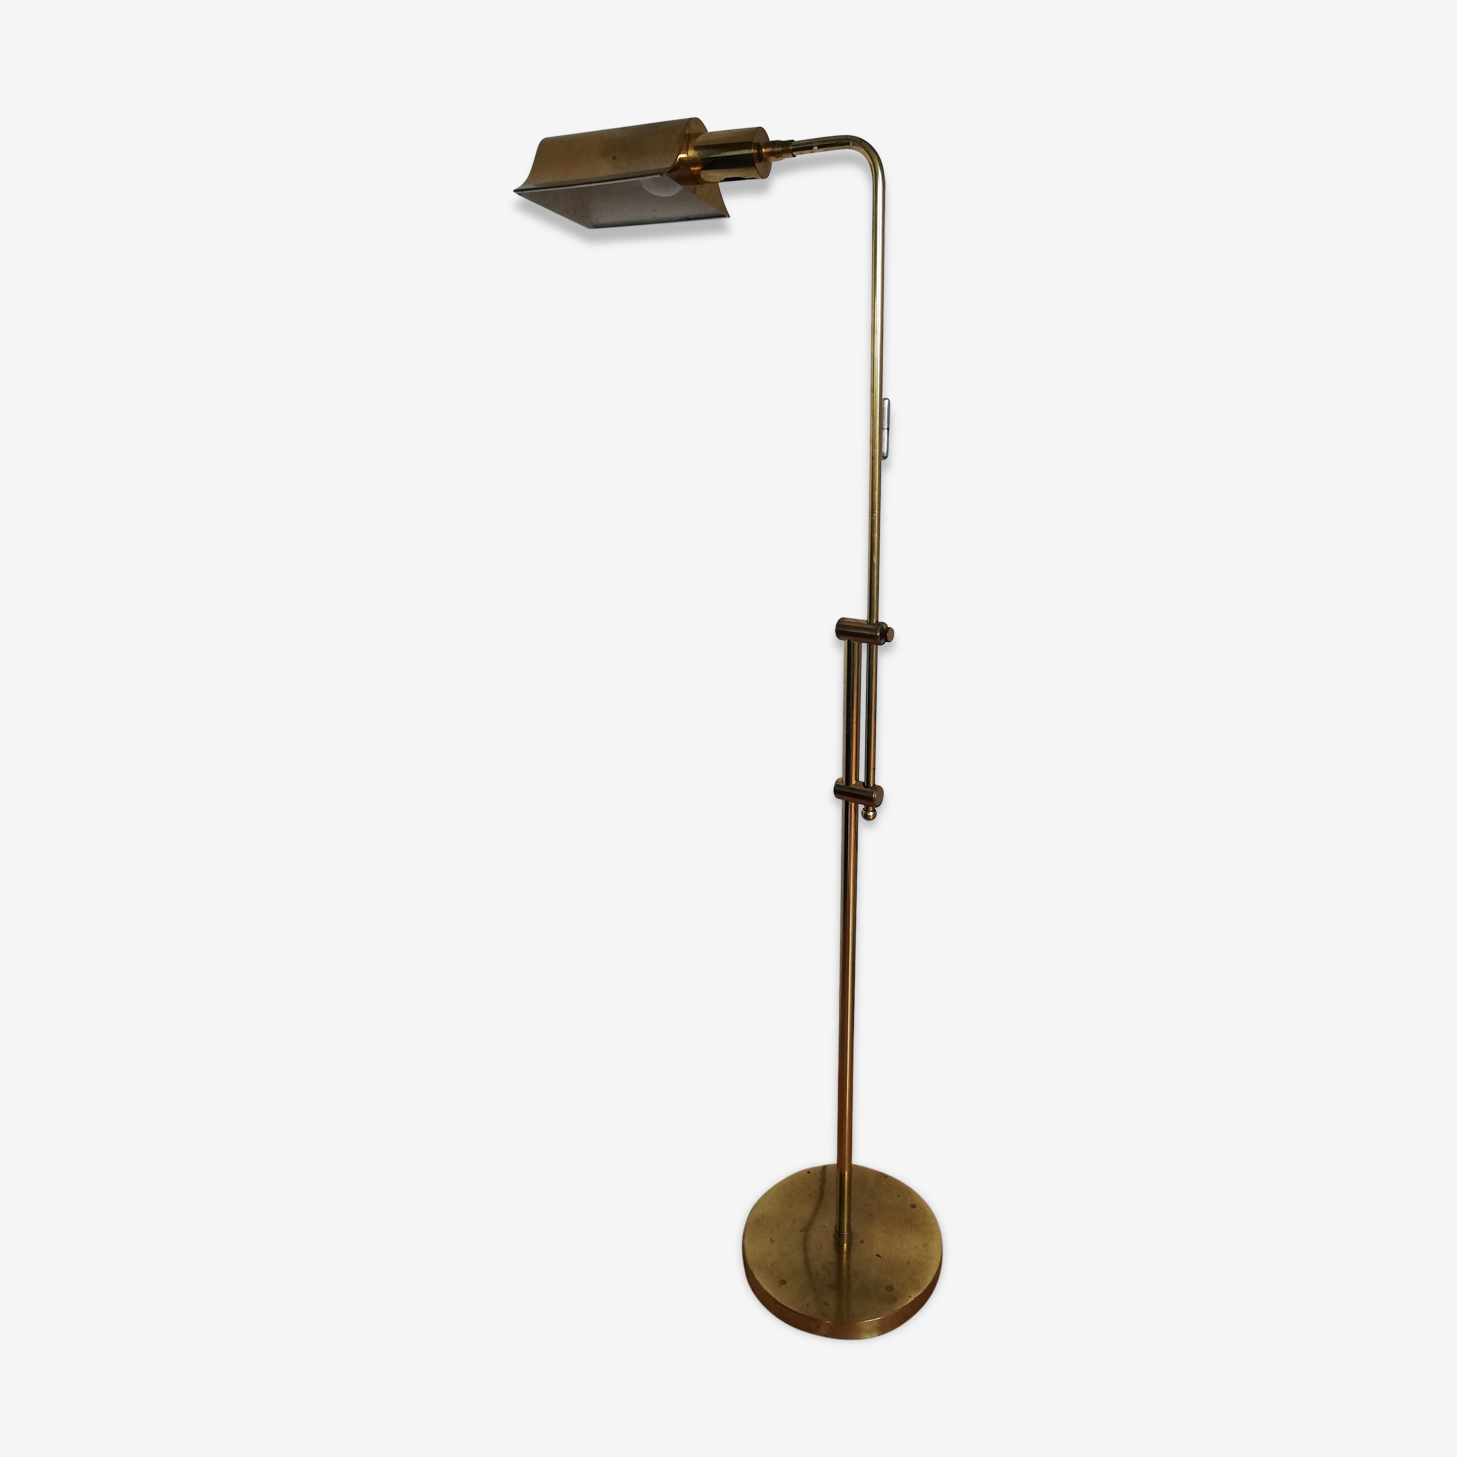 Lampadaire liseuse métal doré design Italy